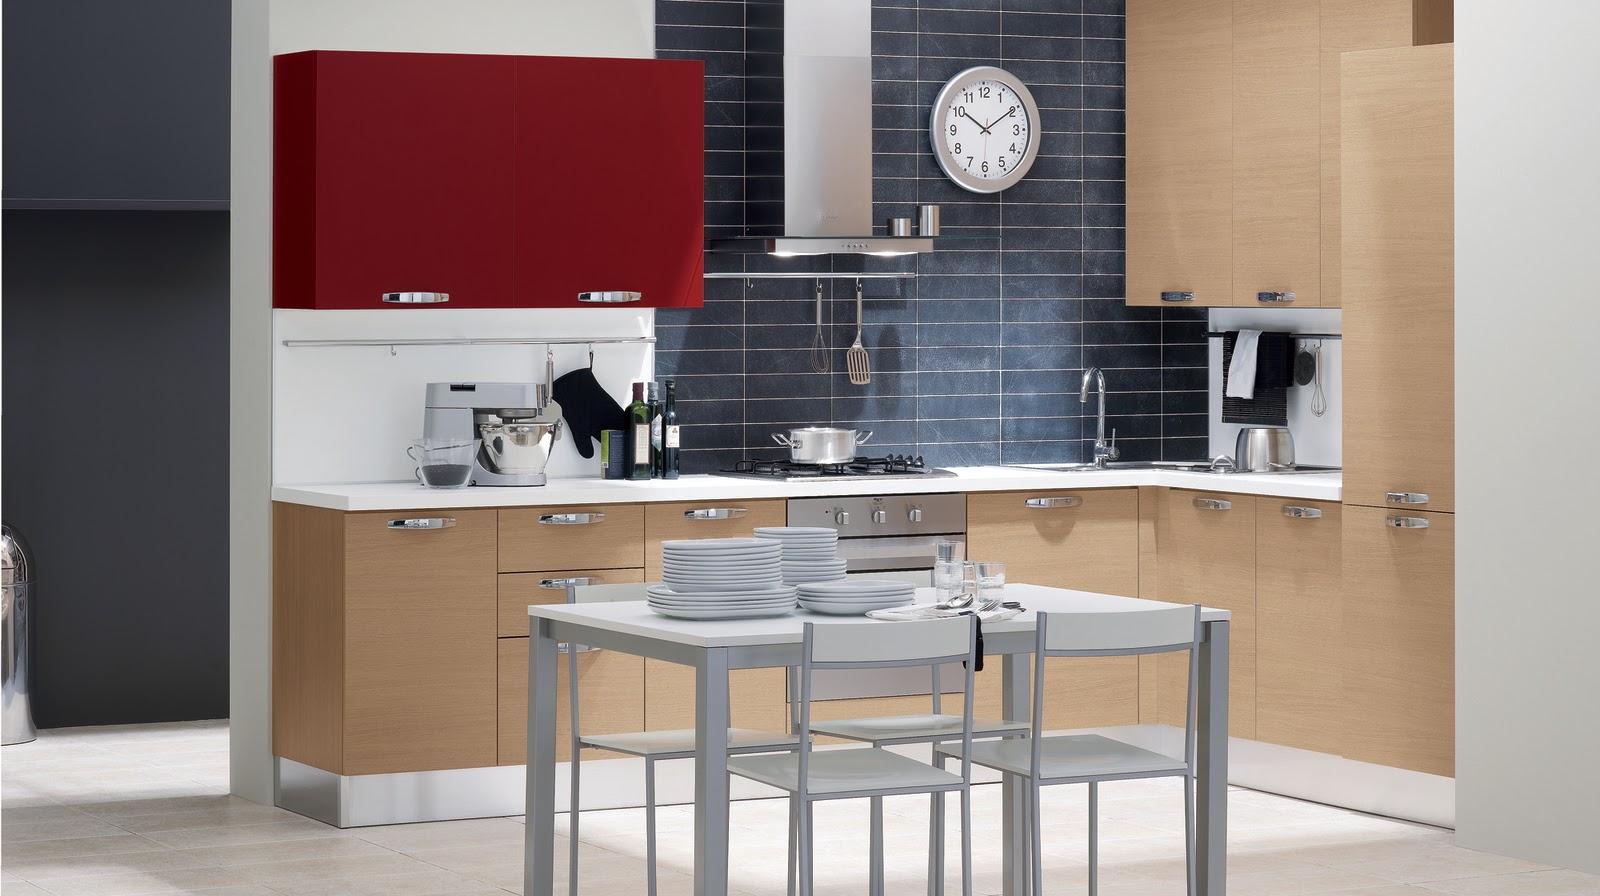 Decora y disena 5 dise os de cocinas color azul - Disenos de cocinas ...